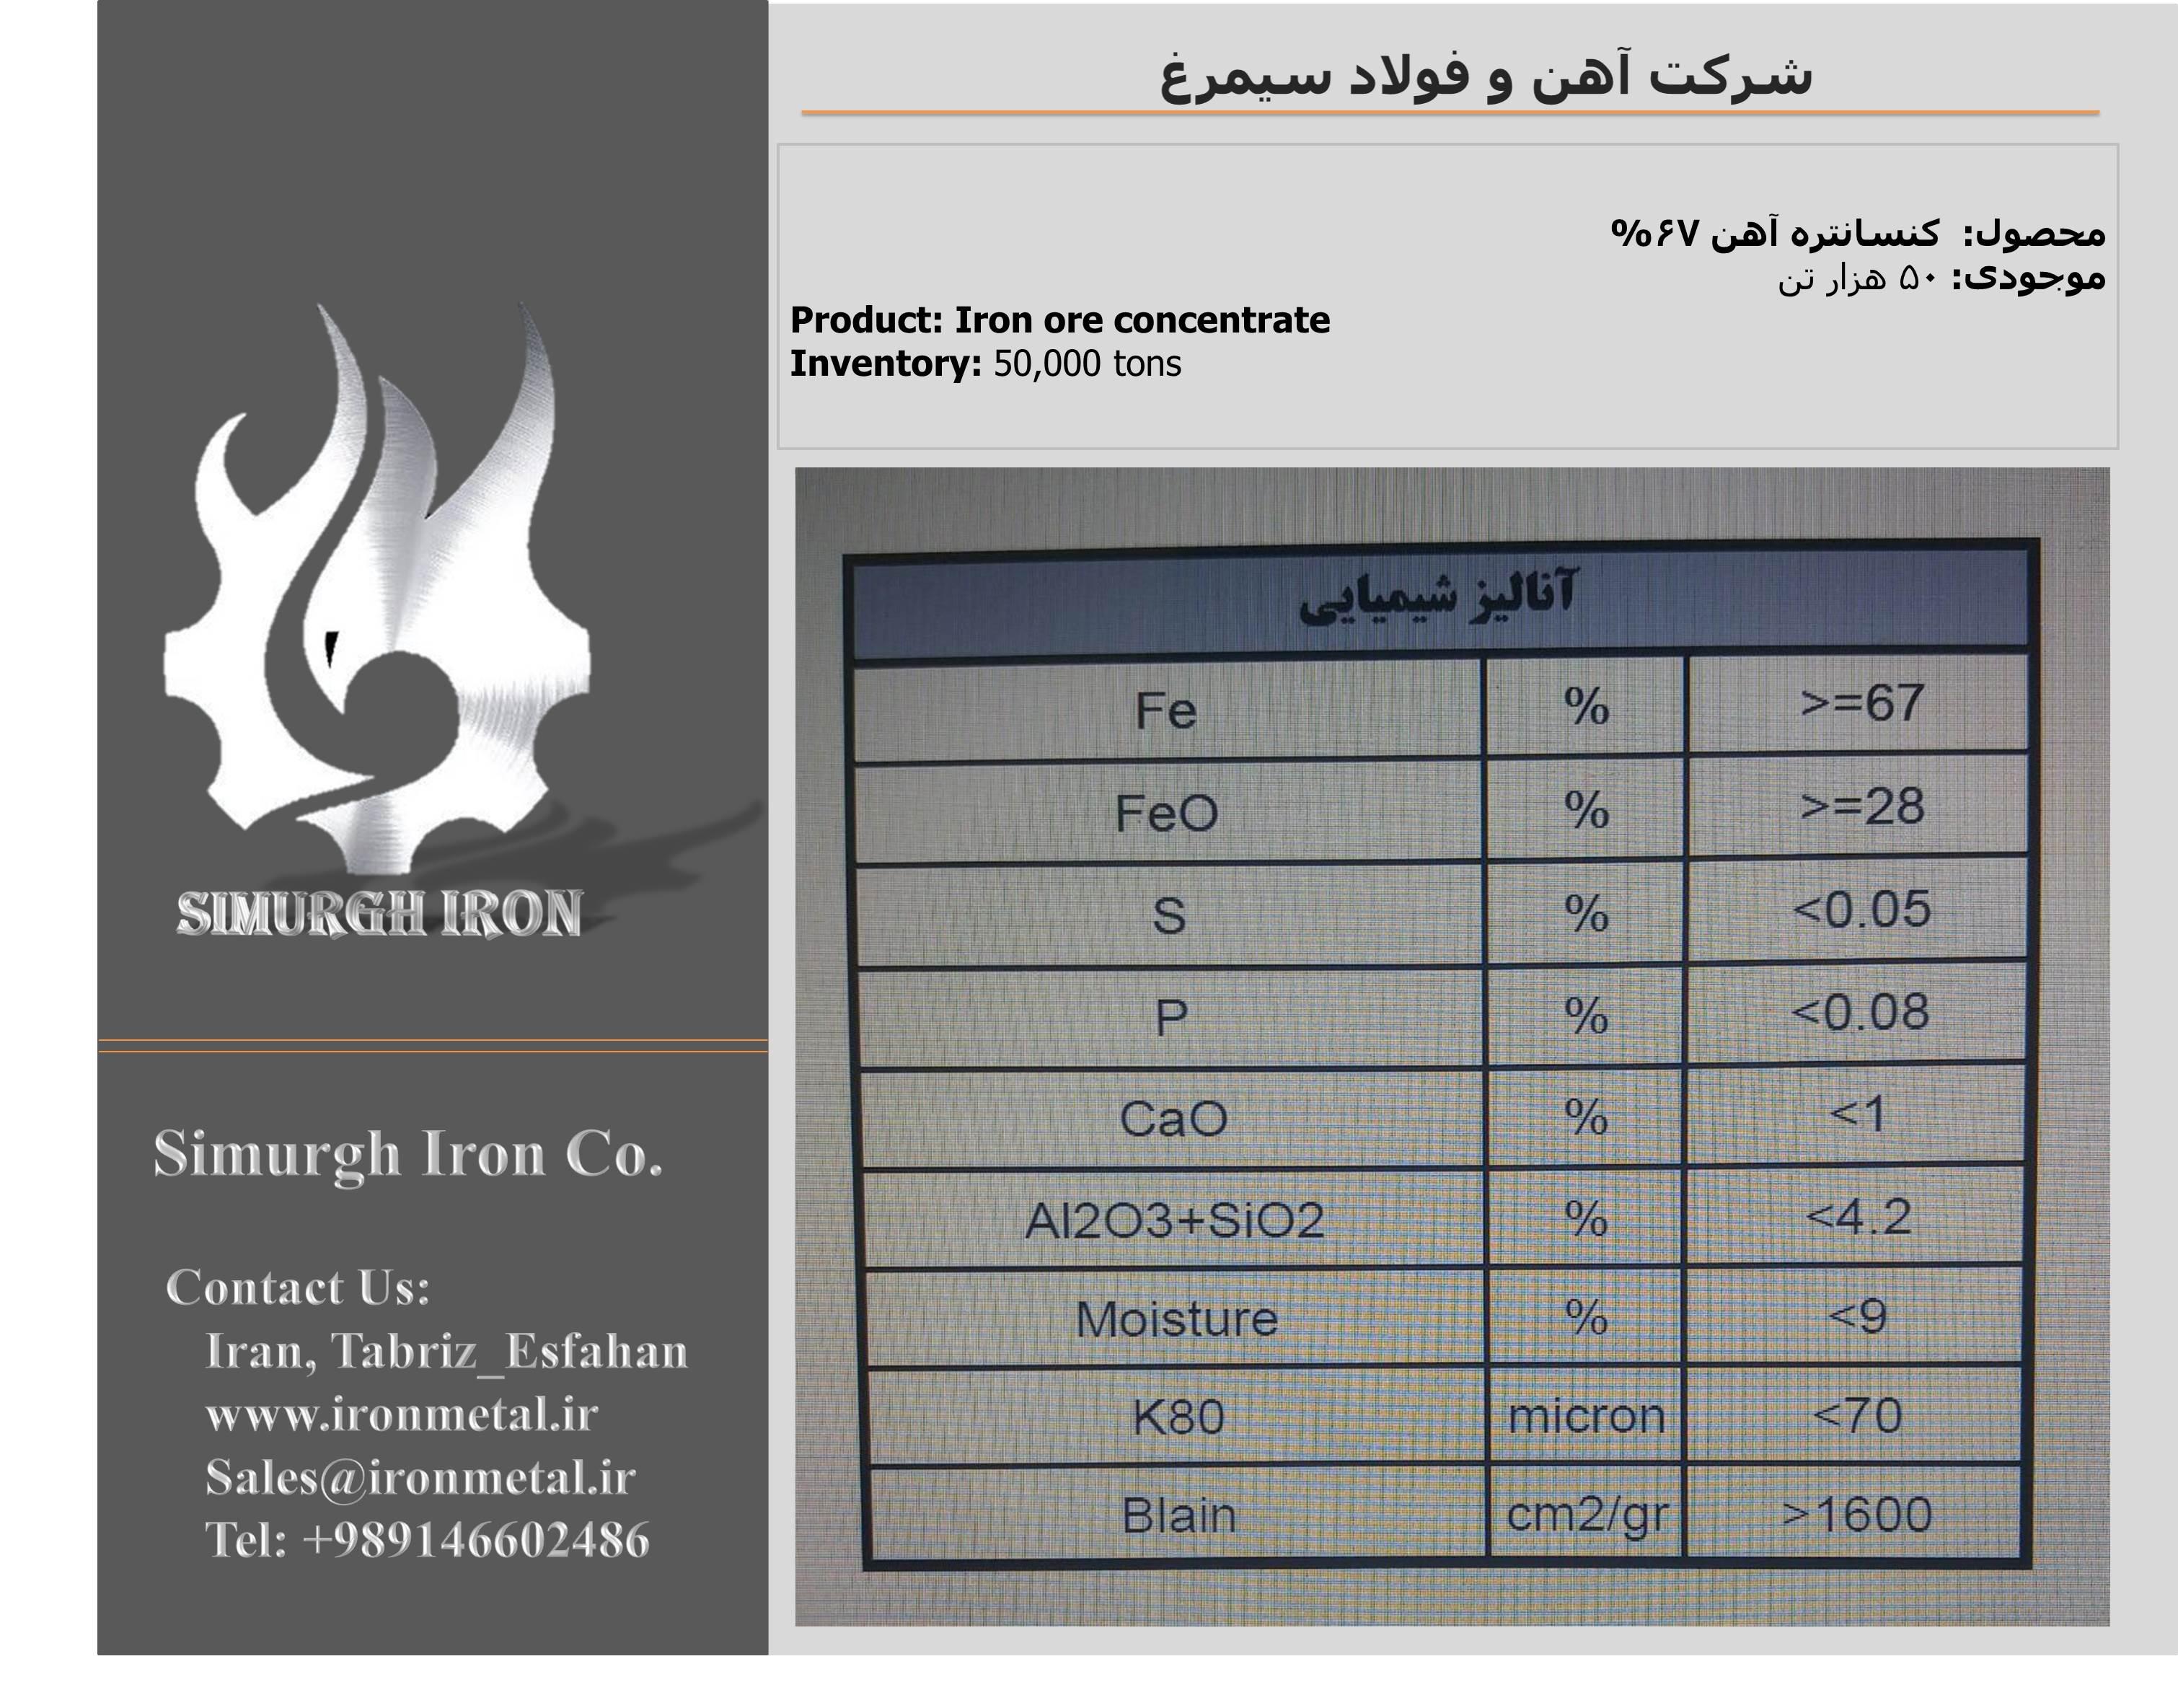 فروش کنسانتره سنگ آهن زنجان